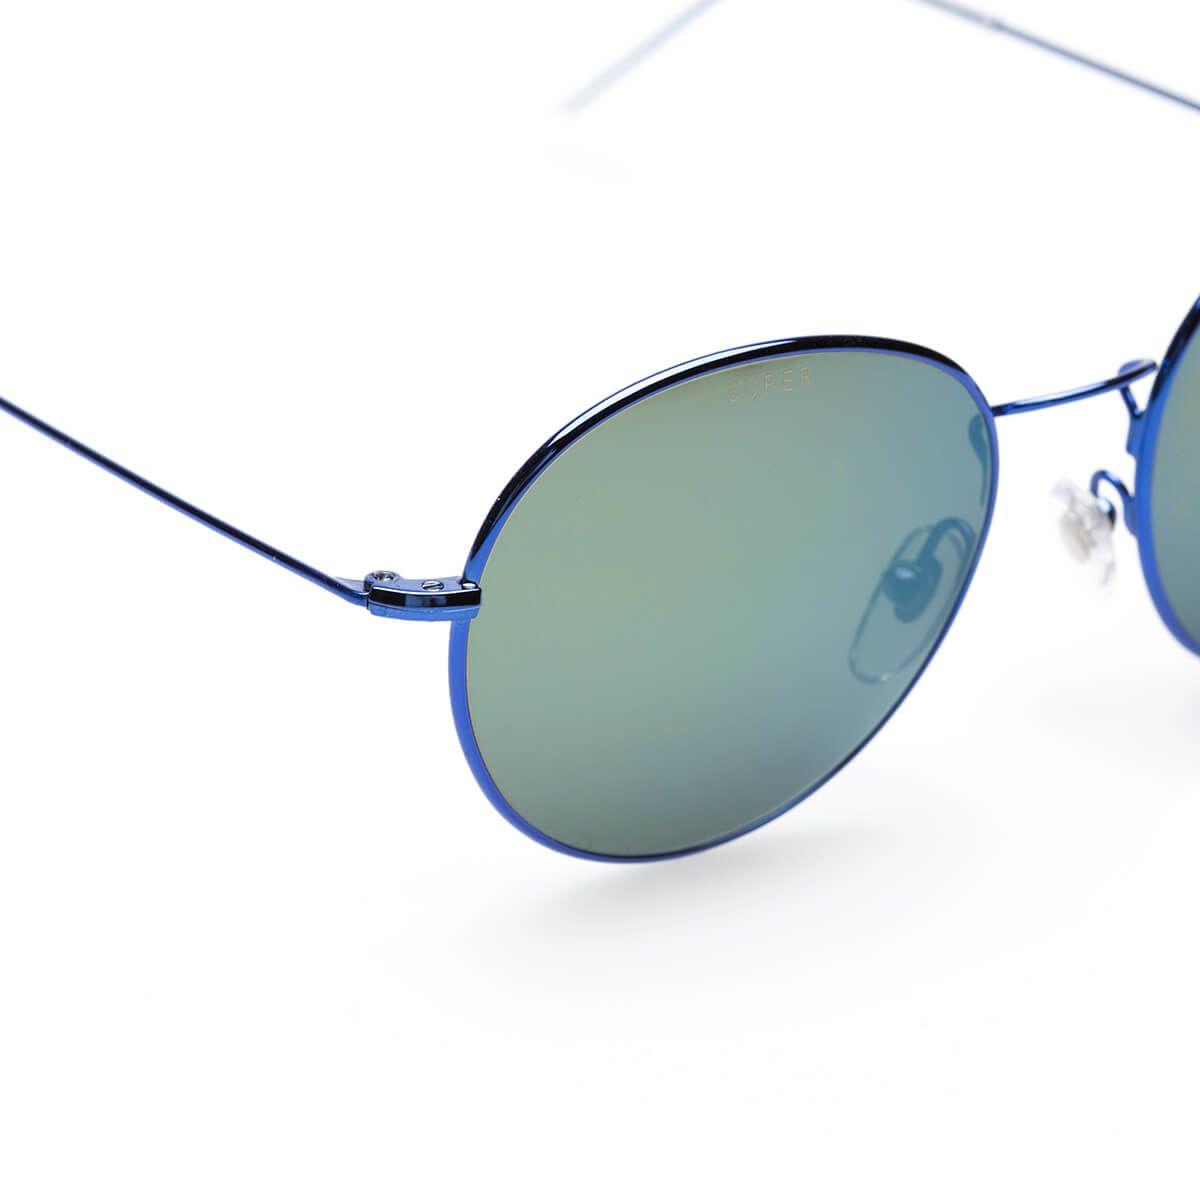 Gosha Rubchinskiy - Gosha Rubchinskiy Super Mens Wire Sunglasses ...